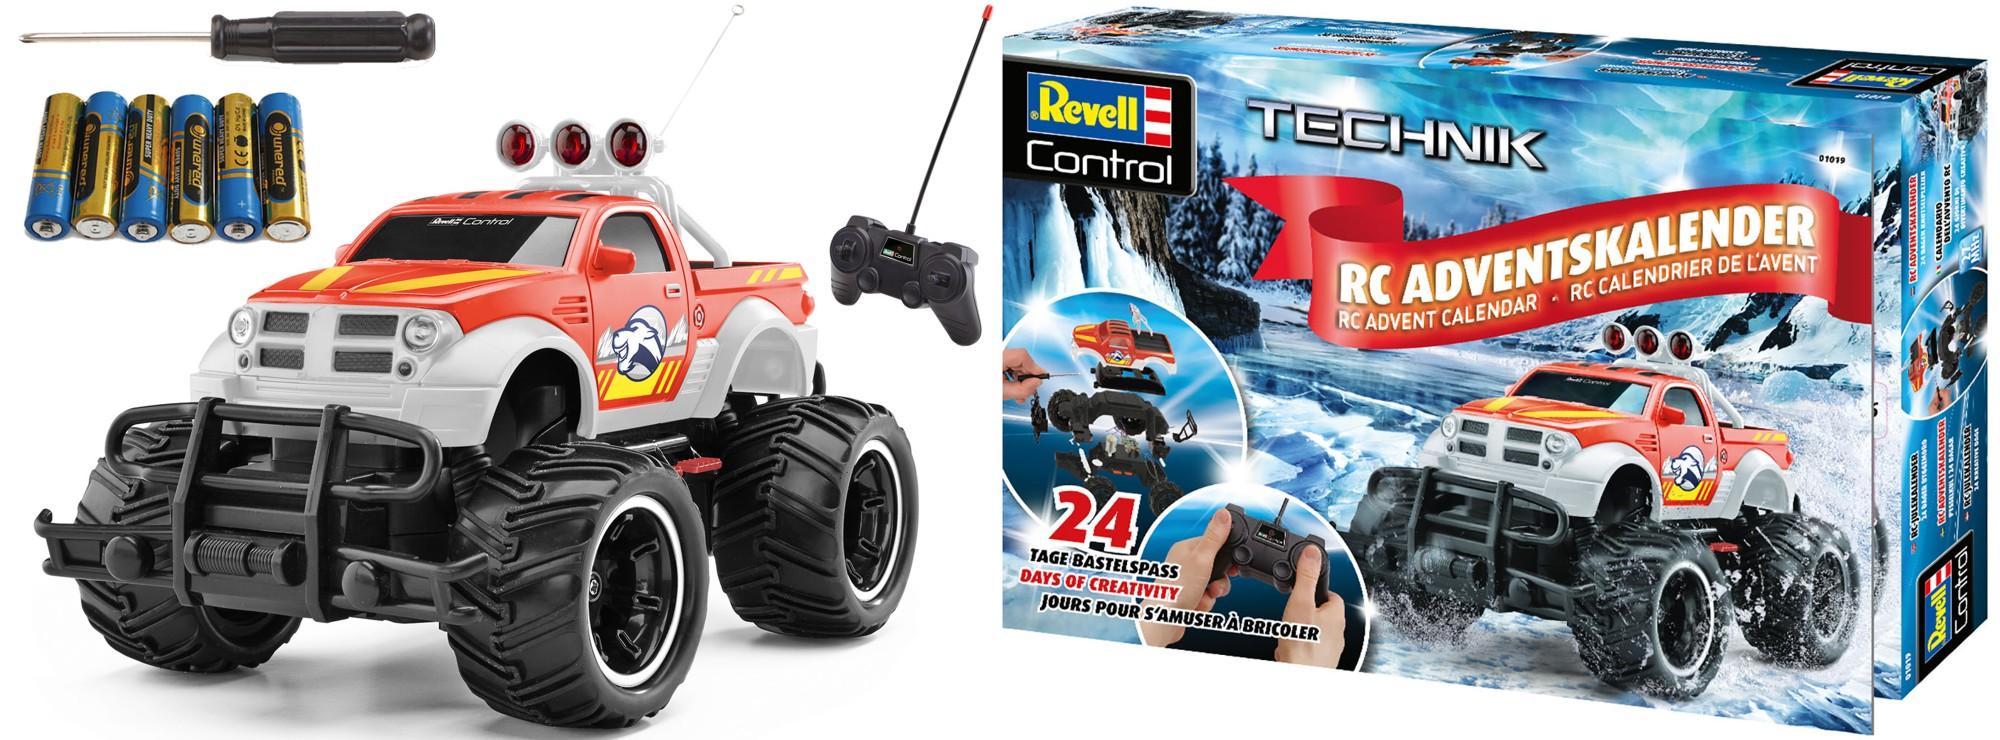 Revell Weihnachtskalender.Revell 01019 Adventskalender 2018 Rc Car Revell Control Rc Spielzeug